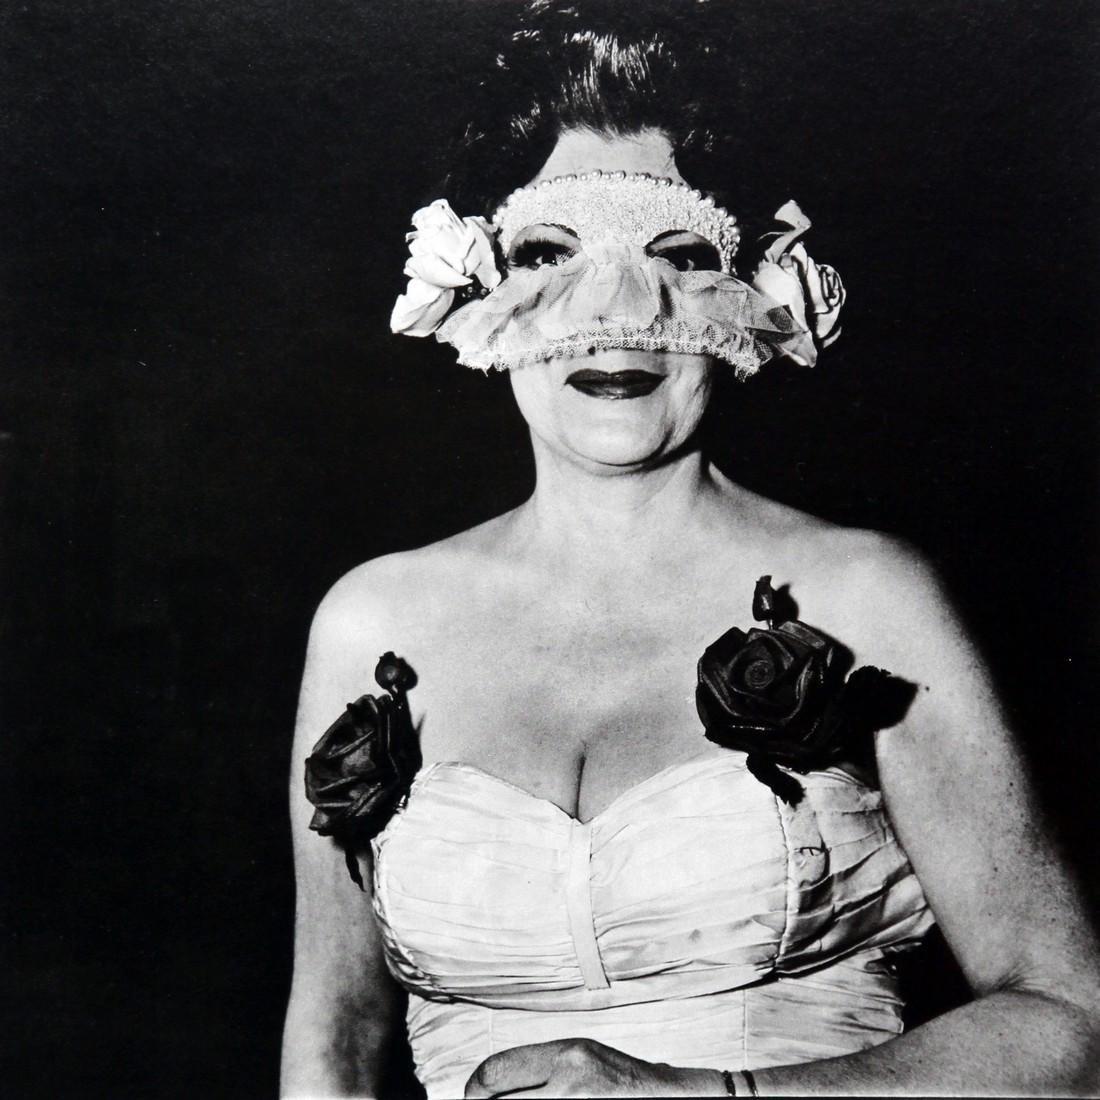 DIANE ARBUS - Lady at masked ball NY 1967